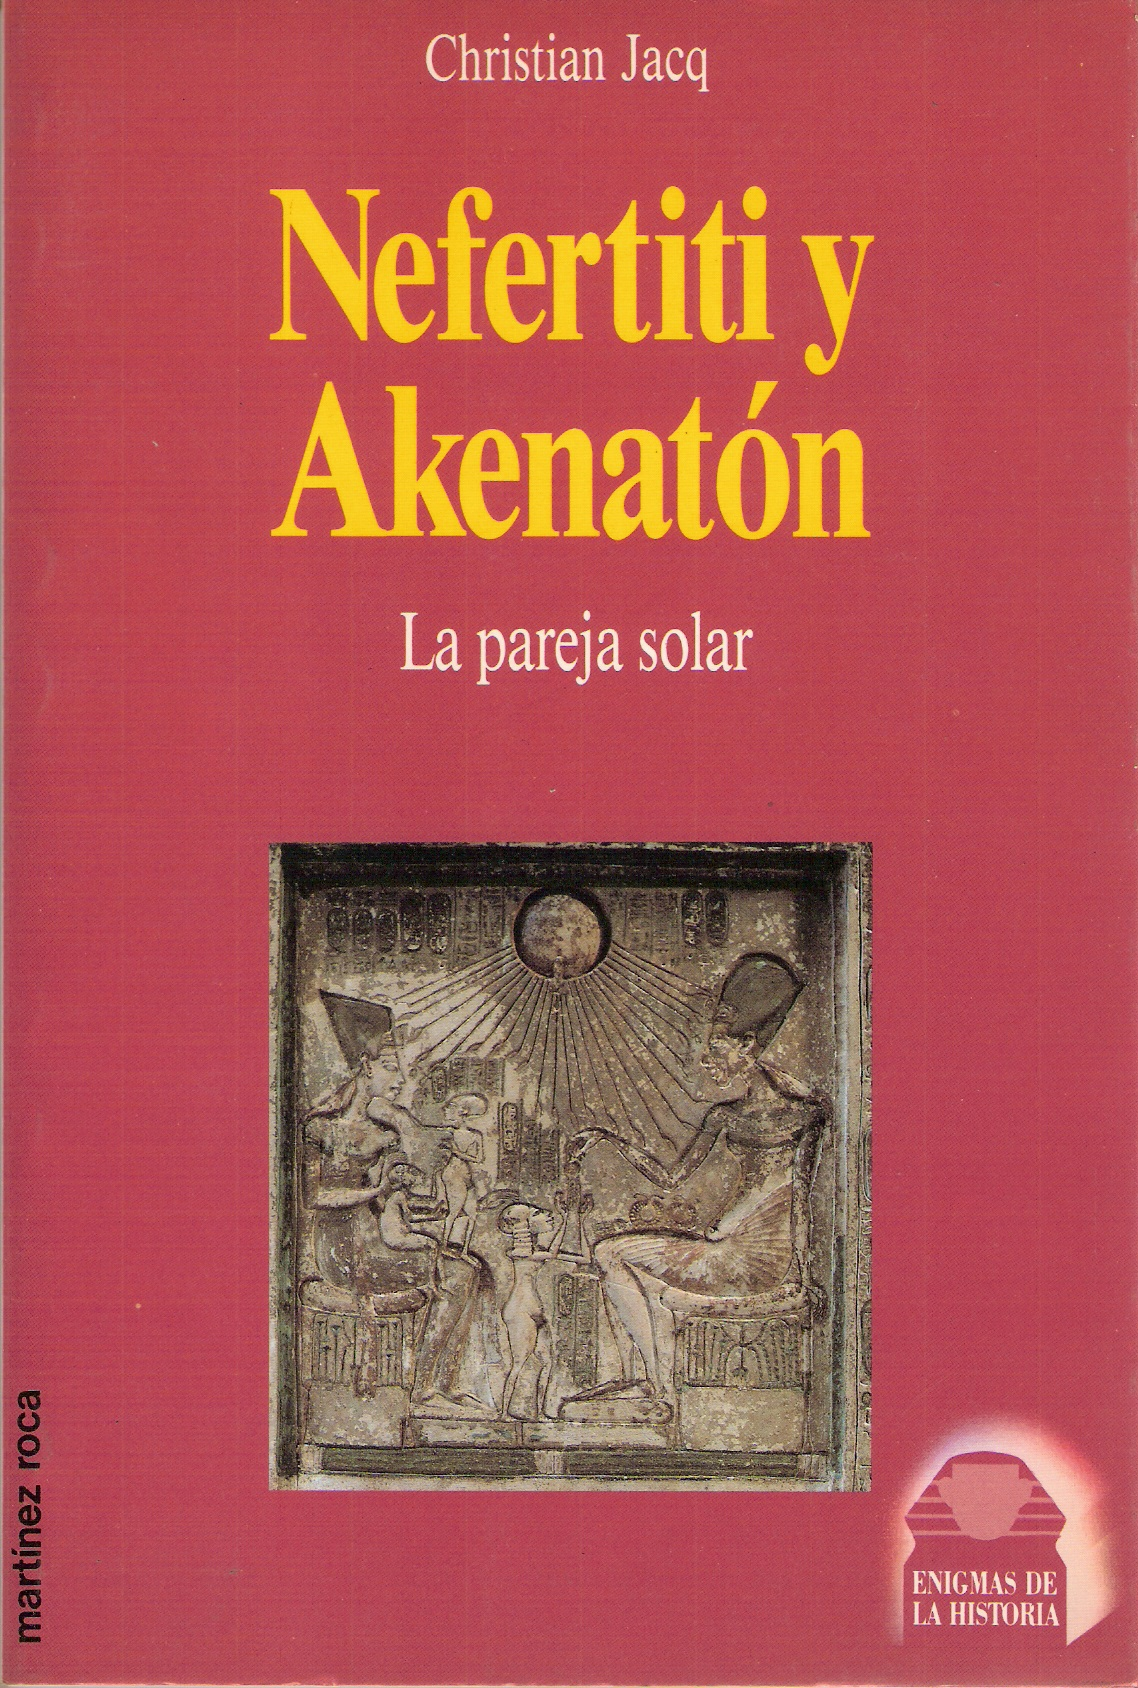 Nefertiti y Akenató...